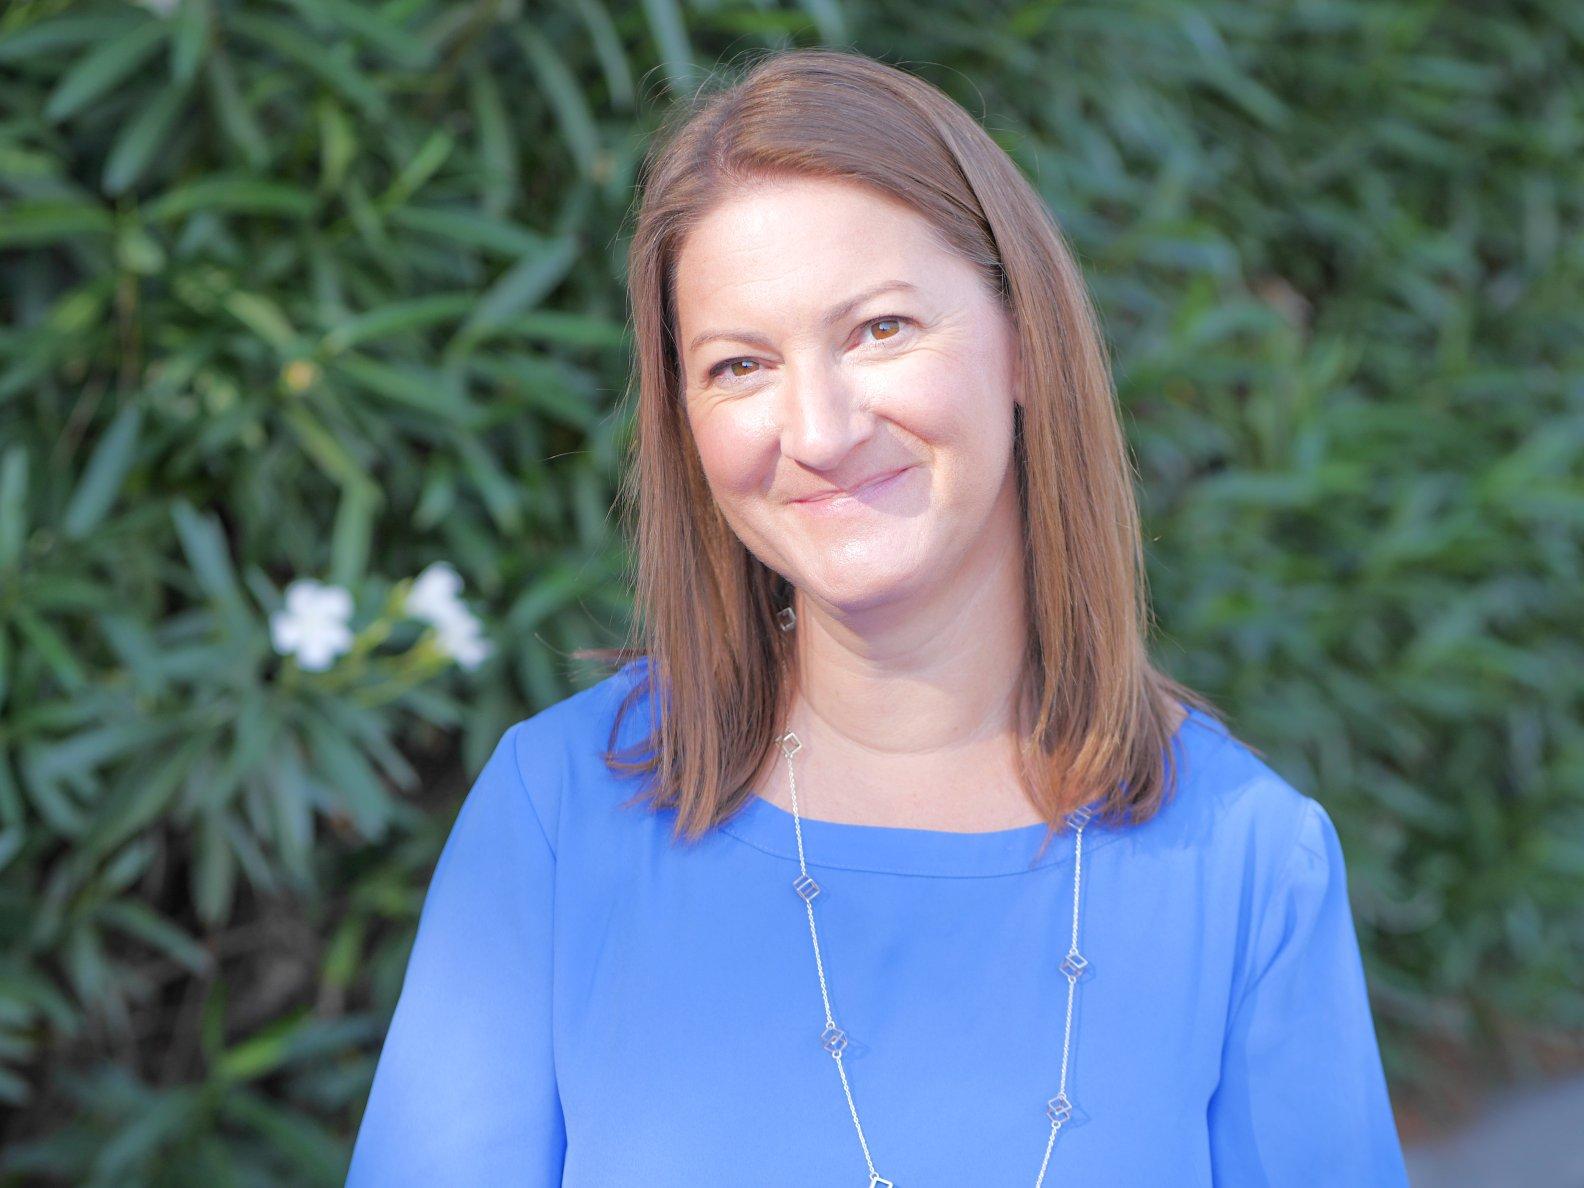 NextNav Adds Decorated Marketing Executive, Gillian Smith, as Vice President of Marketing